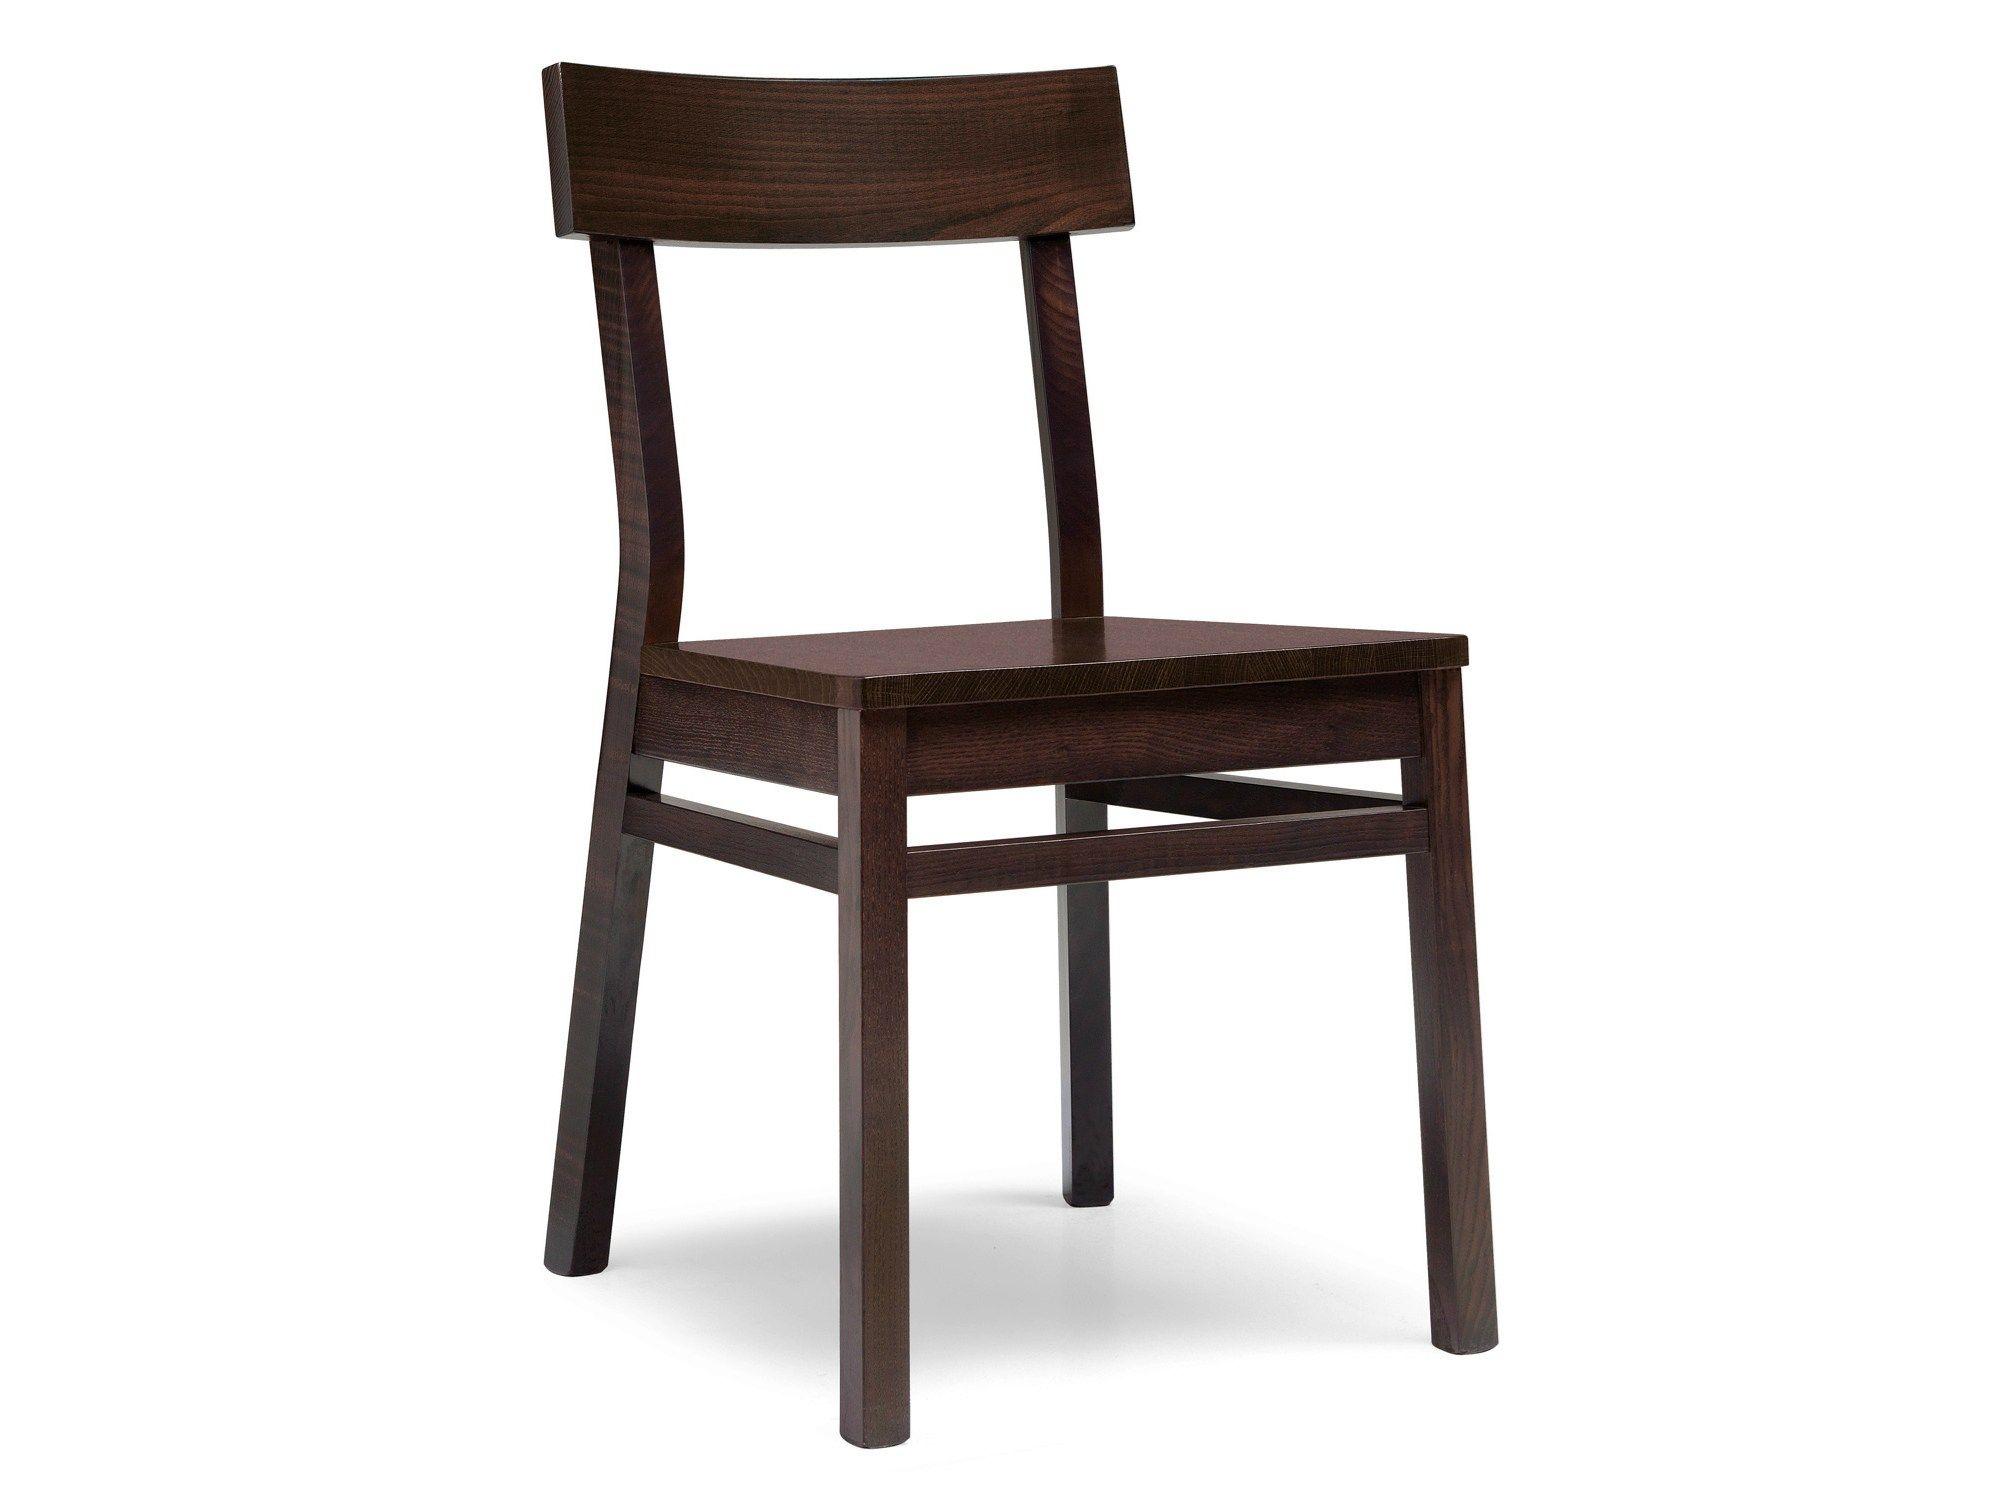 Chaise en h tre italia 439 c by palma for Chaise en hetre